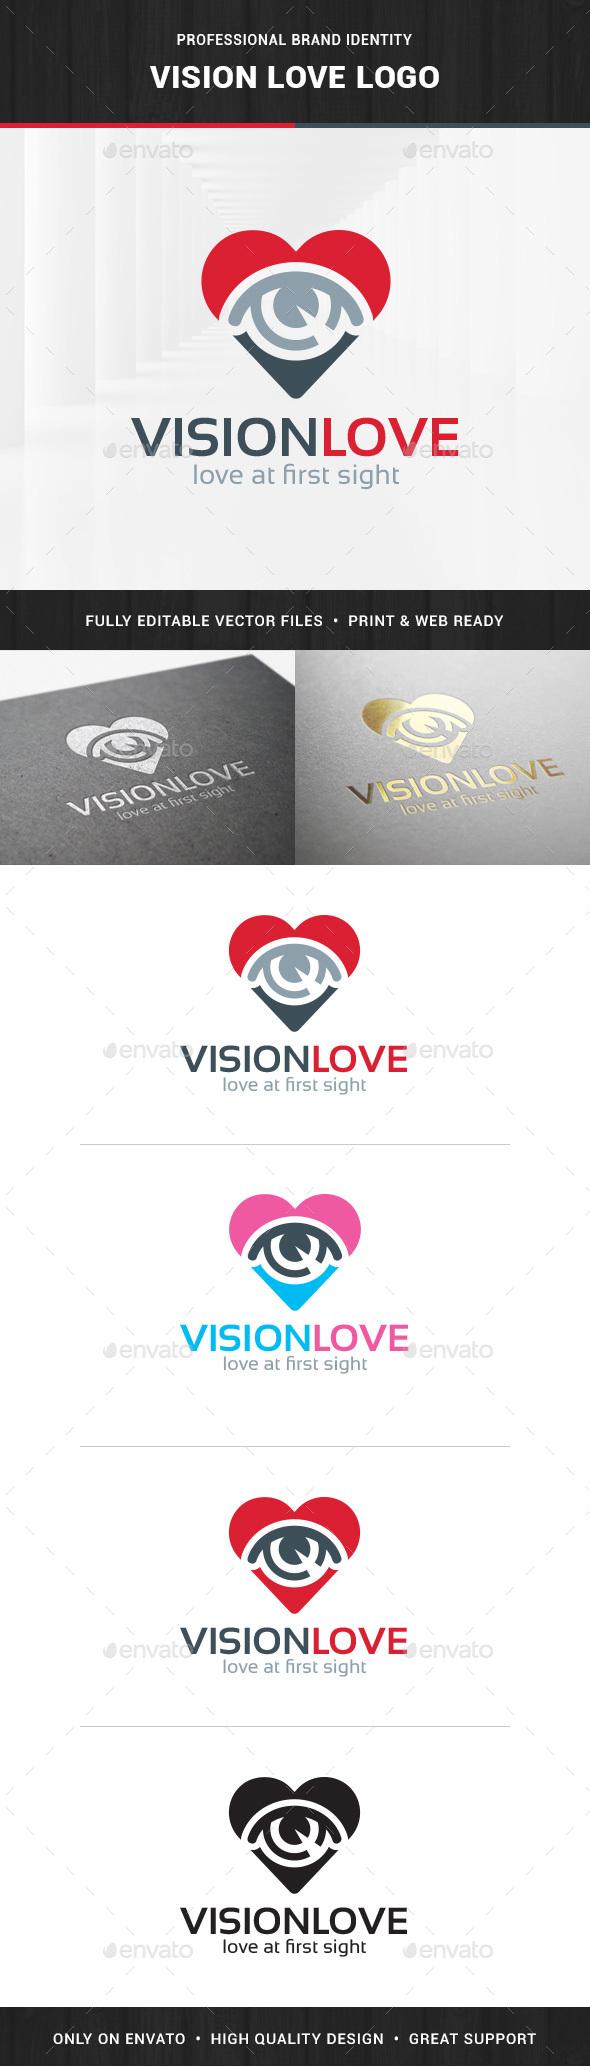 Vision Love Logo Template - Symbols Logo Templates